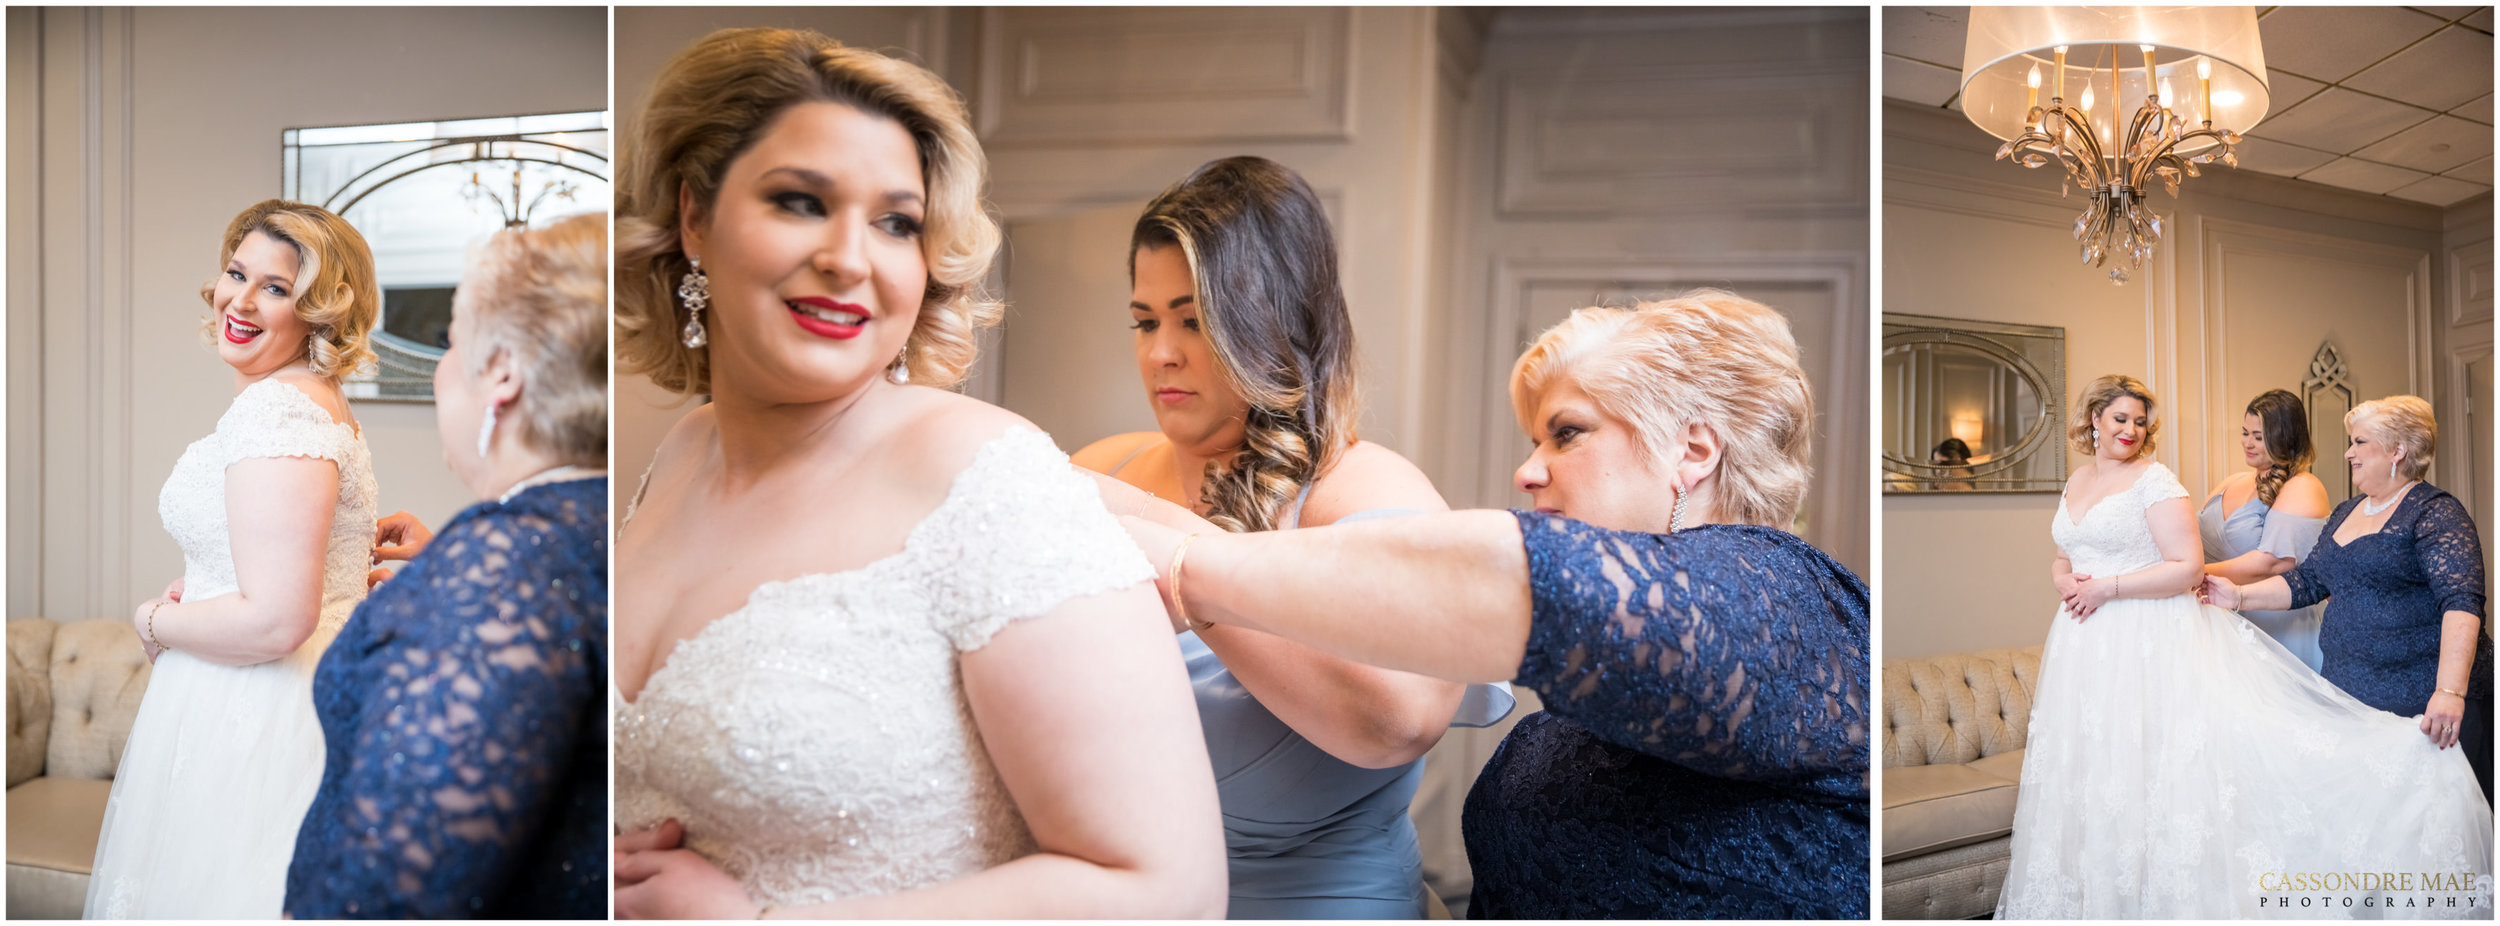 Cassondre Mae Photography Poughkeepsie NY Wedding 6.jpg